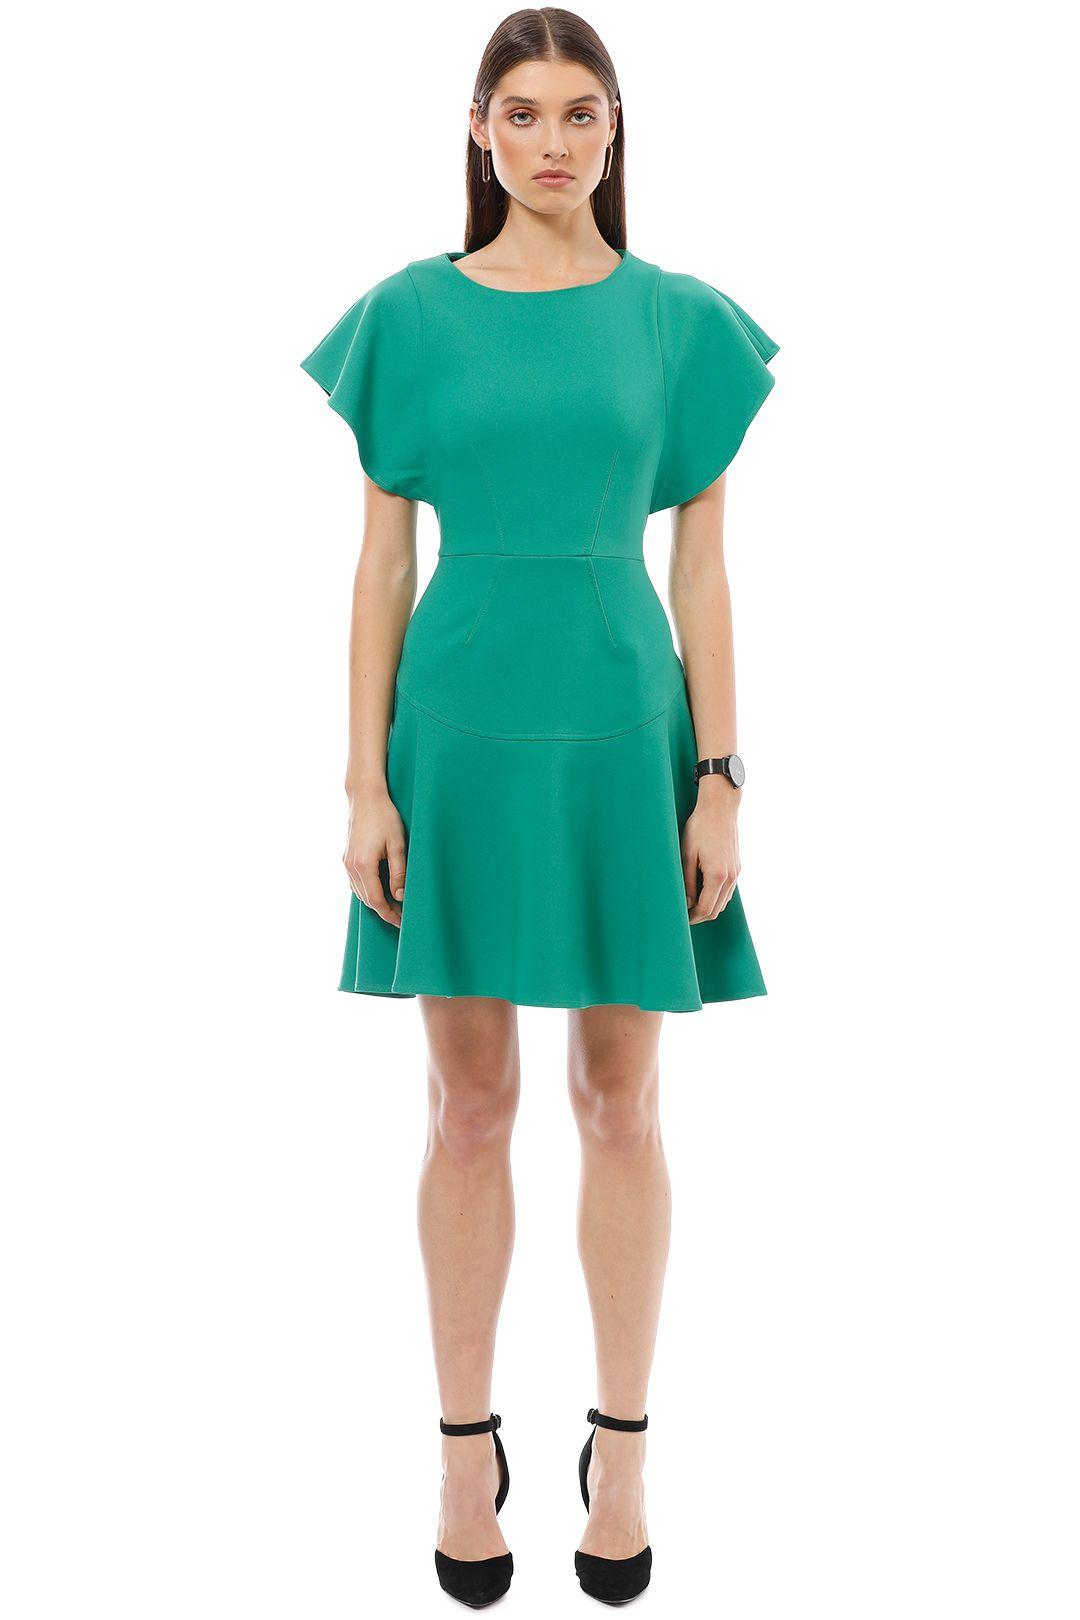 Closet London - Frill Sleeve Flared Dress - Green - Front